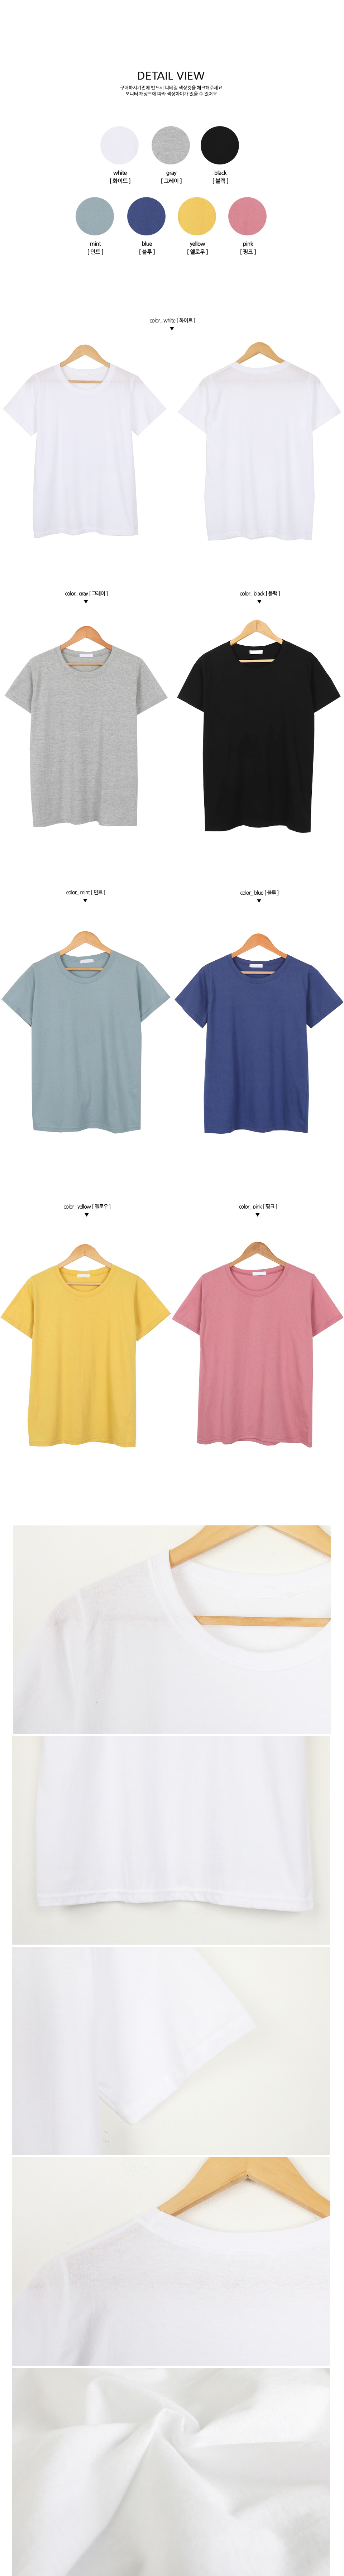 (1 + 1 plan special price) Basic round short sleeve